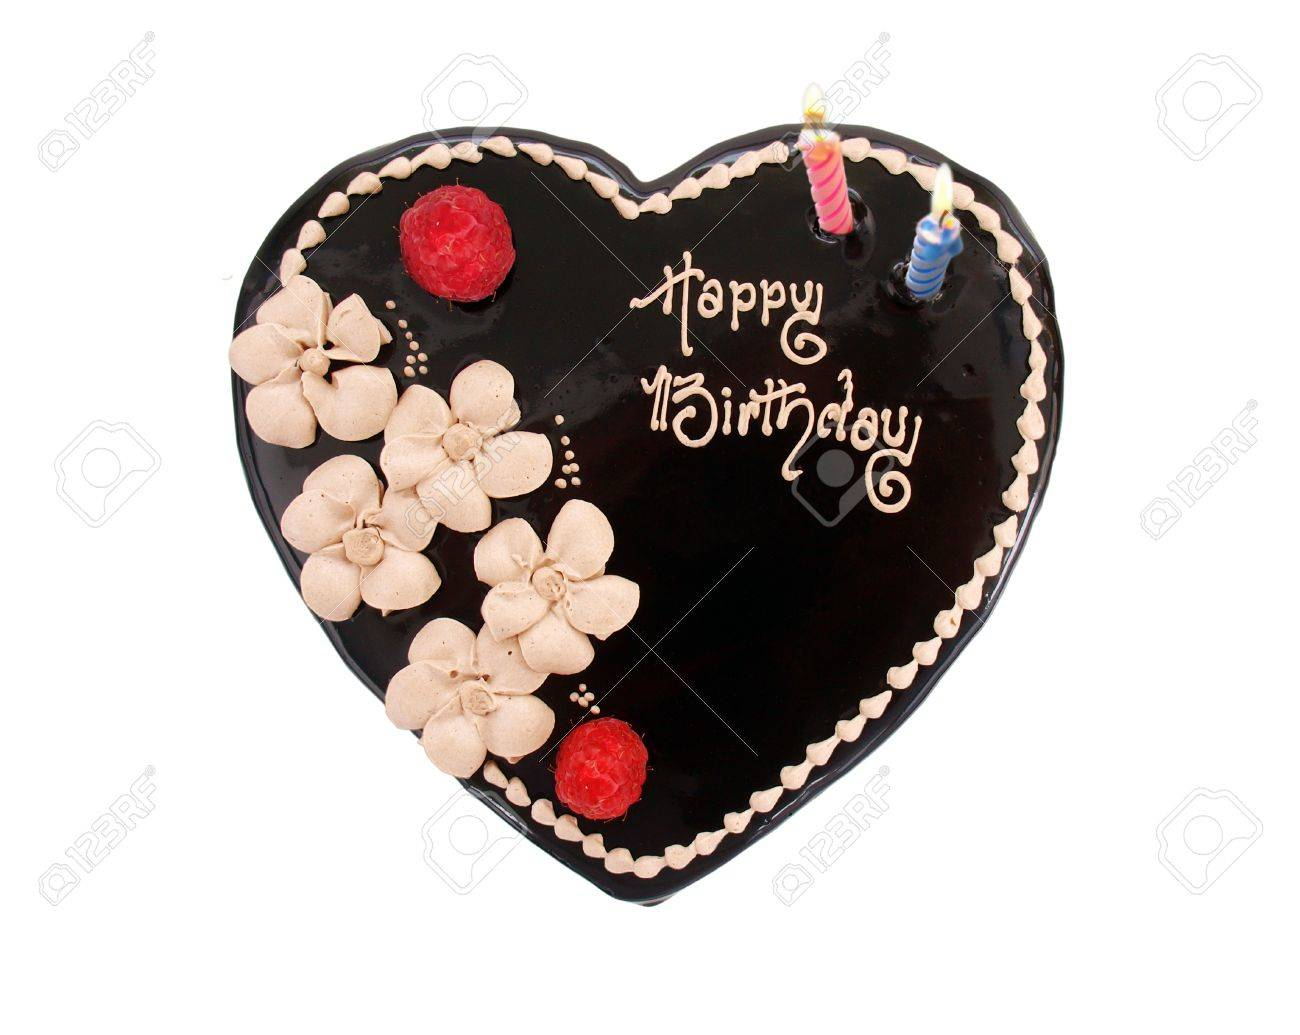 Heart Shaped Chocolate Birthday Cake On White Background Stock Photo